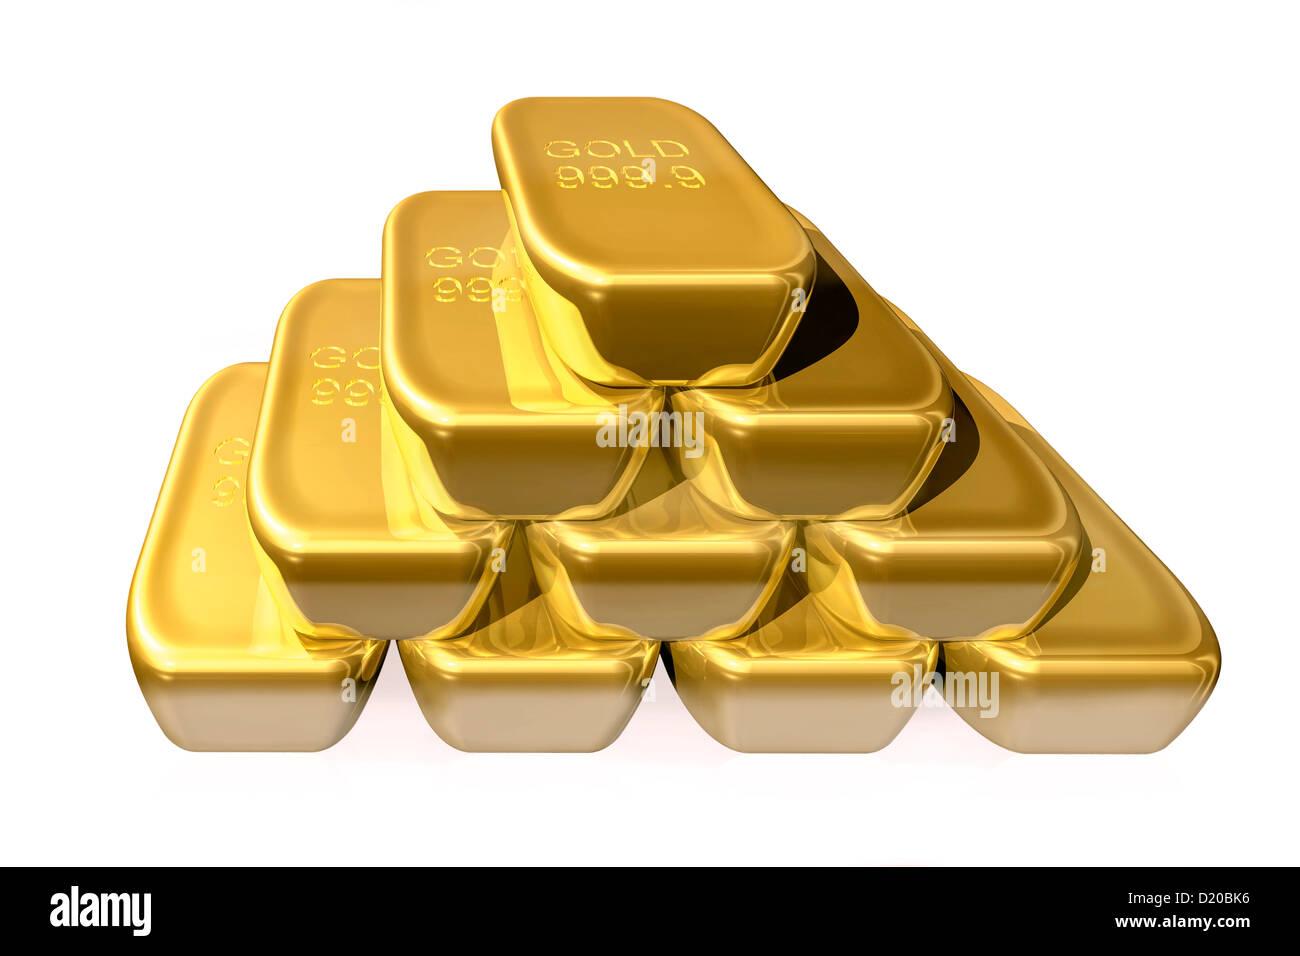 Einen Haufen, Stapel, Haufen, Zeile, Zeilen, feine, echte pure Goldbarren Bars Aussparung ausschneiden Ausschnitt Stockbild